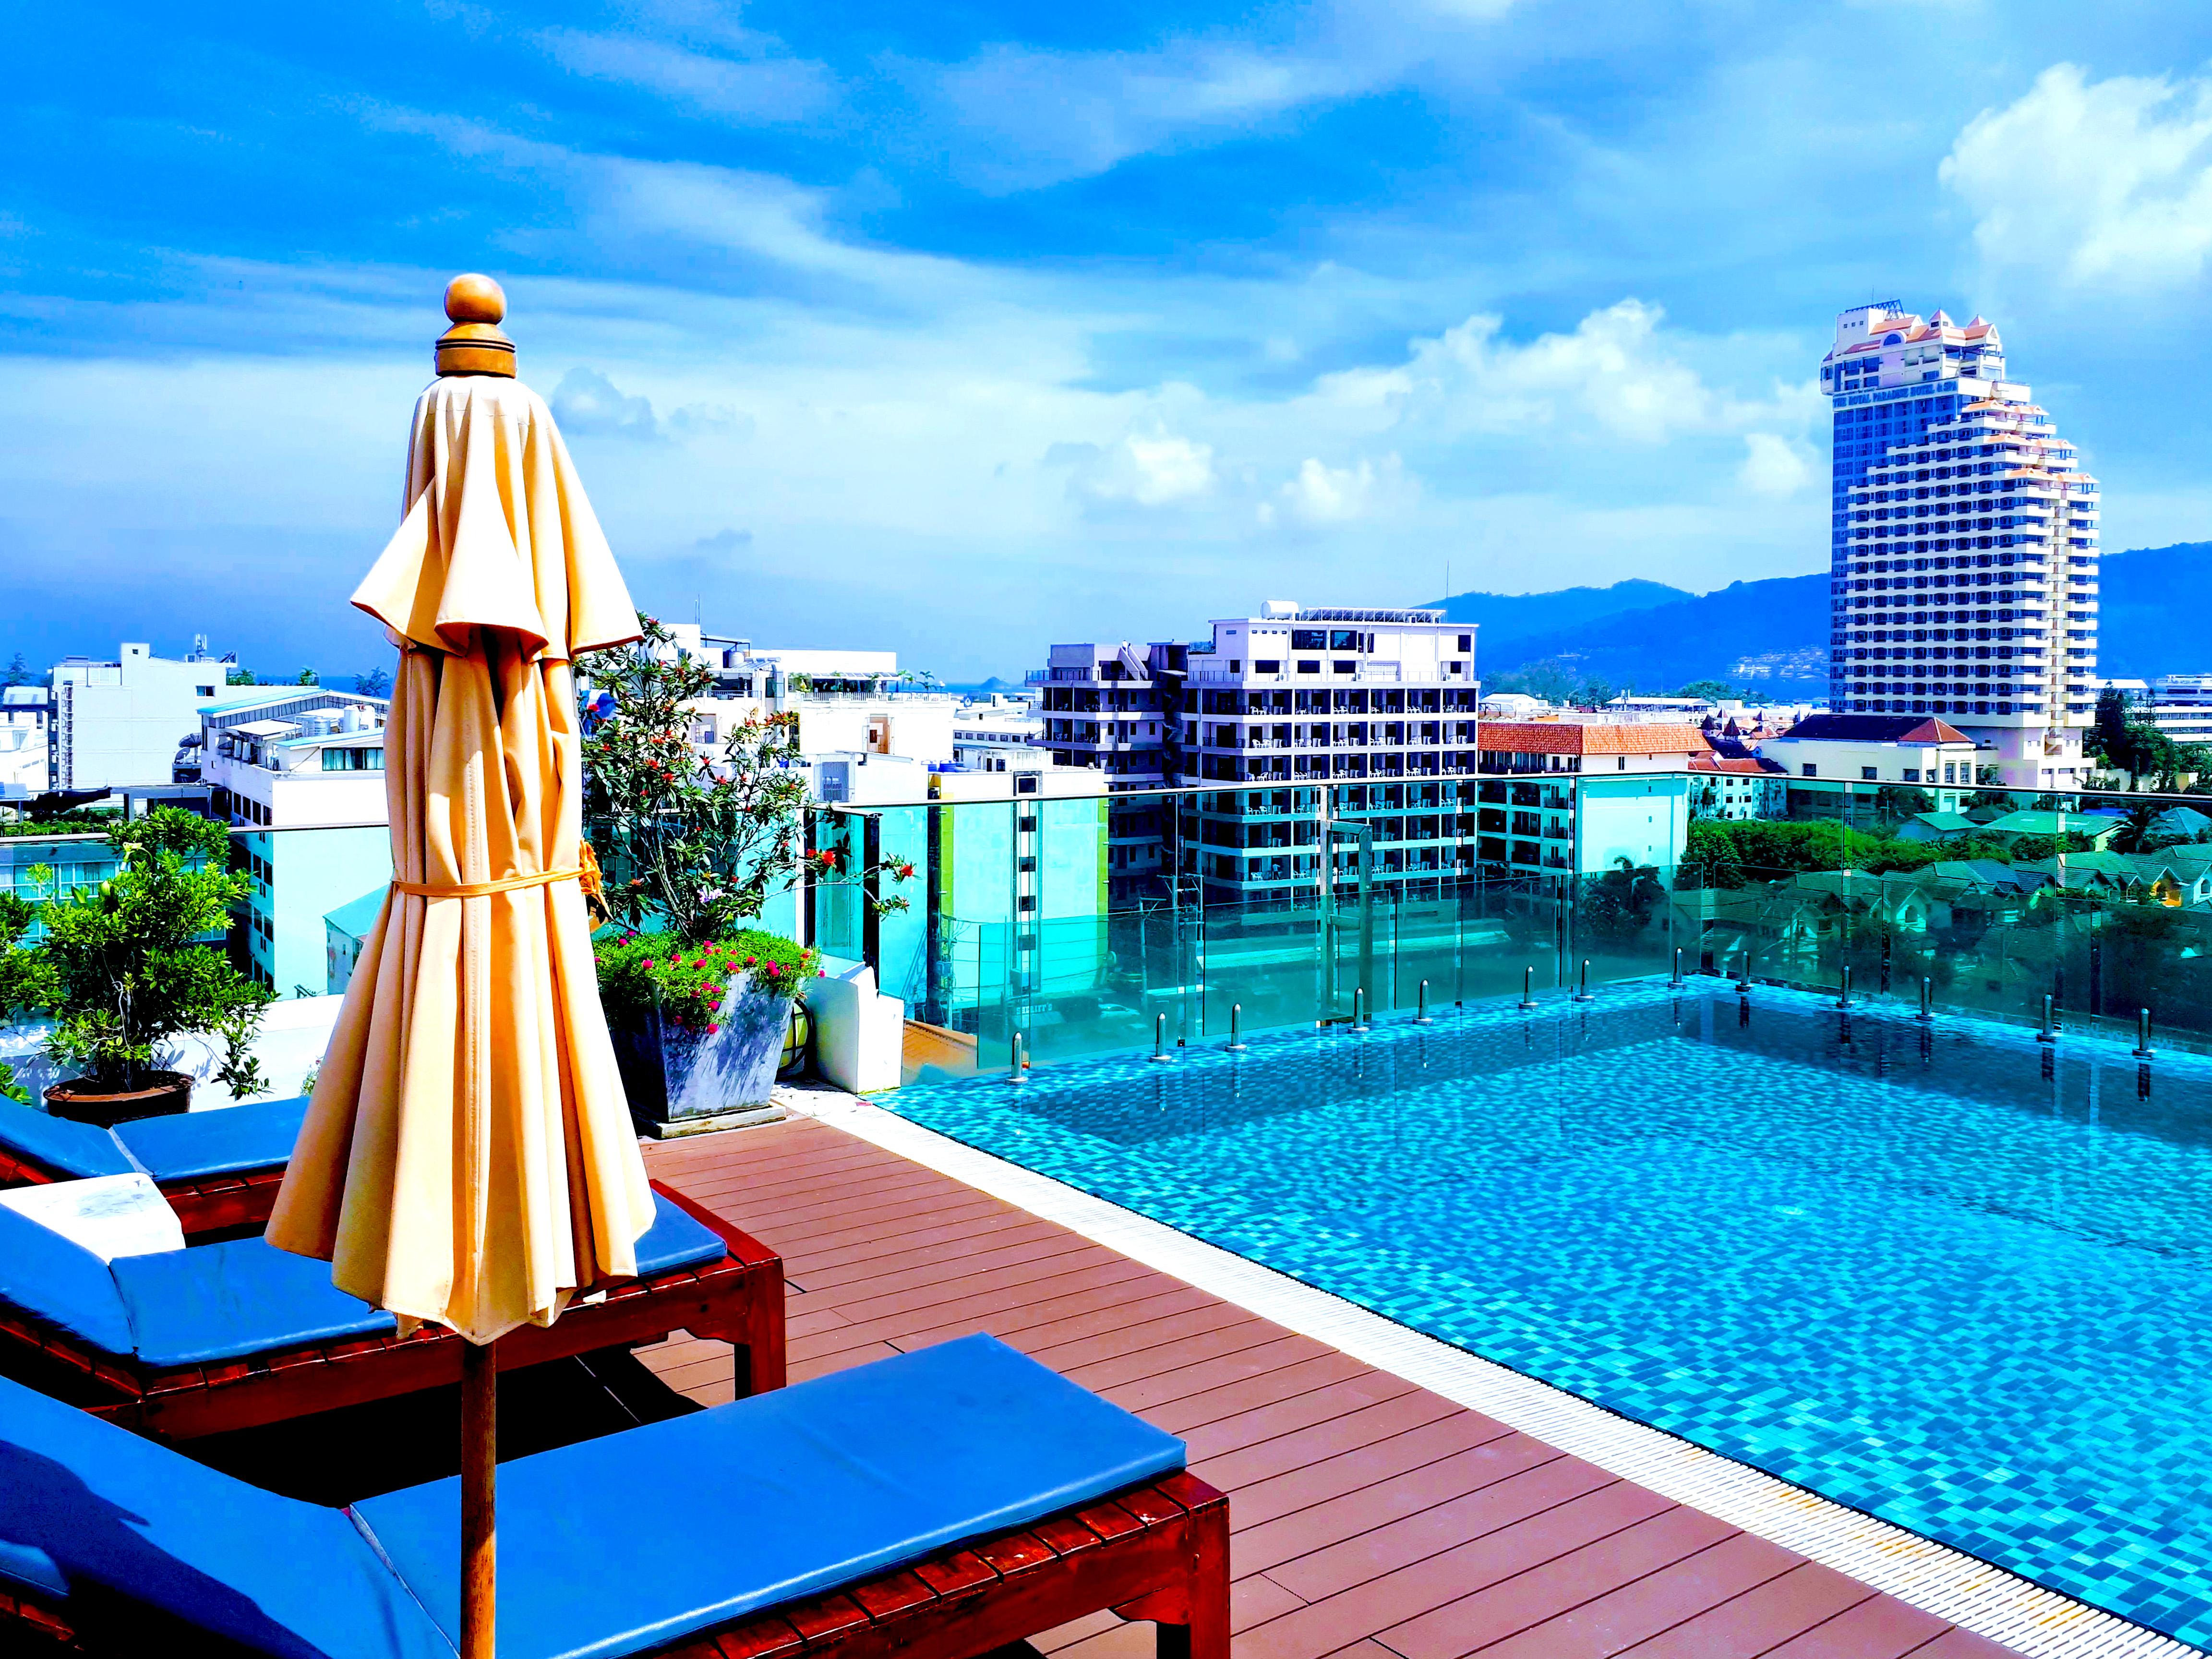 patong city hotel